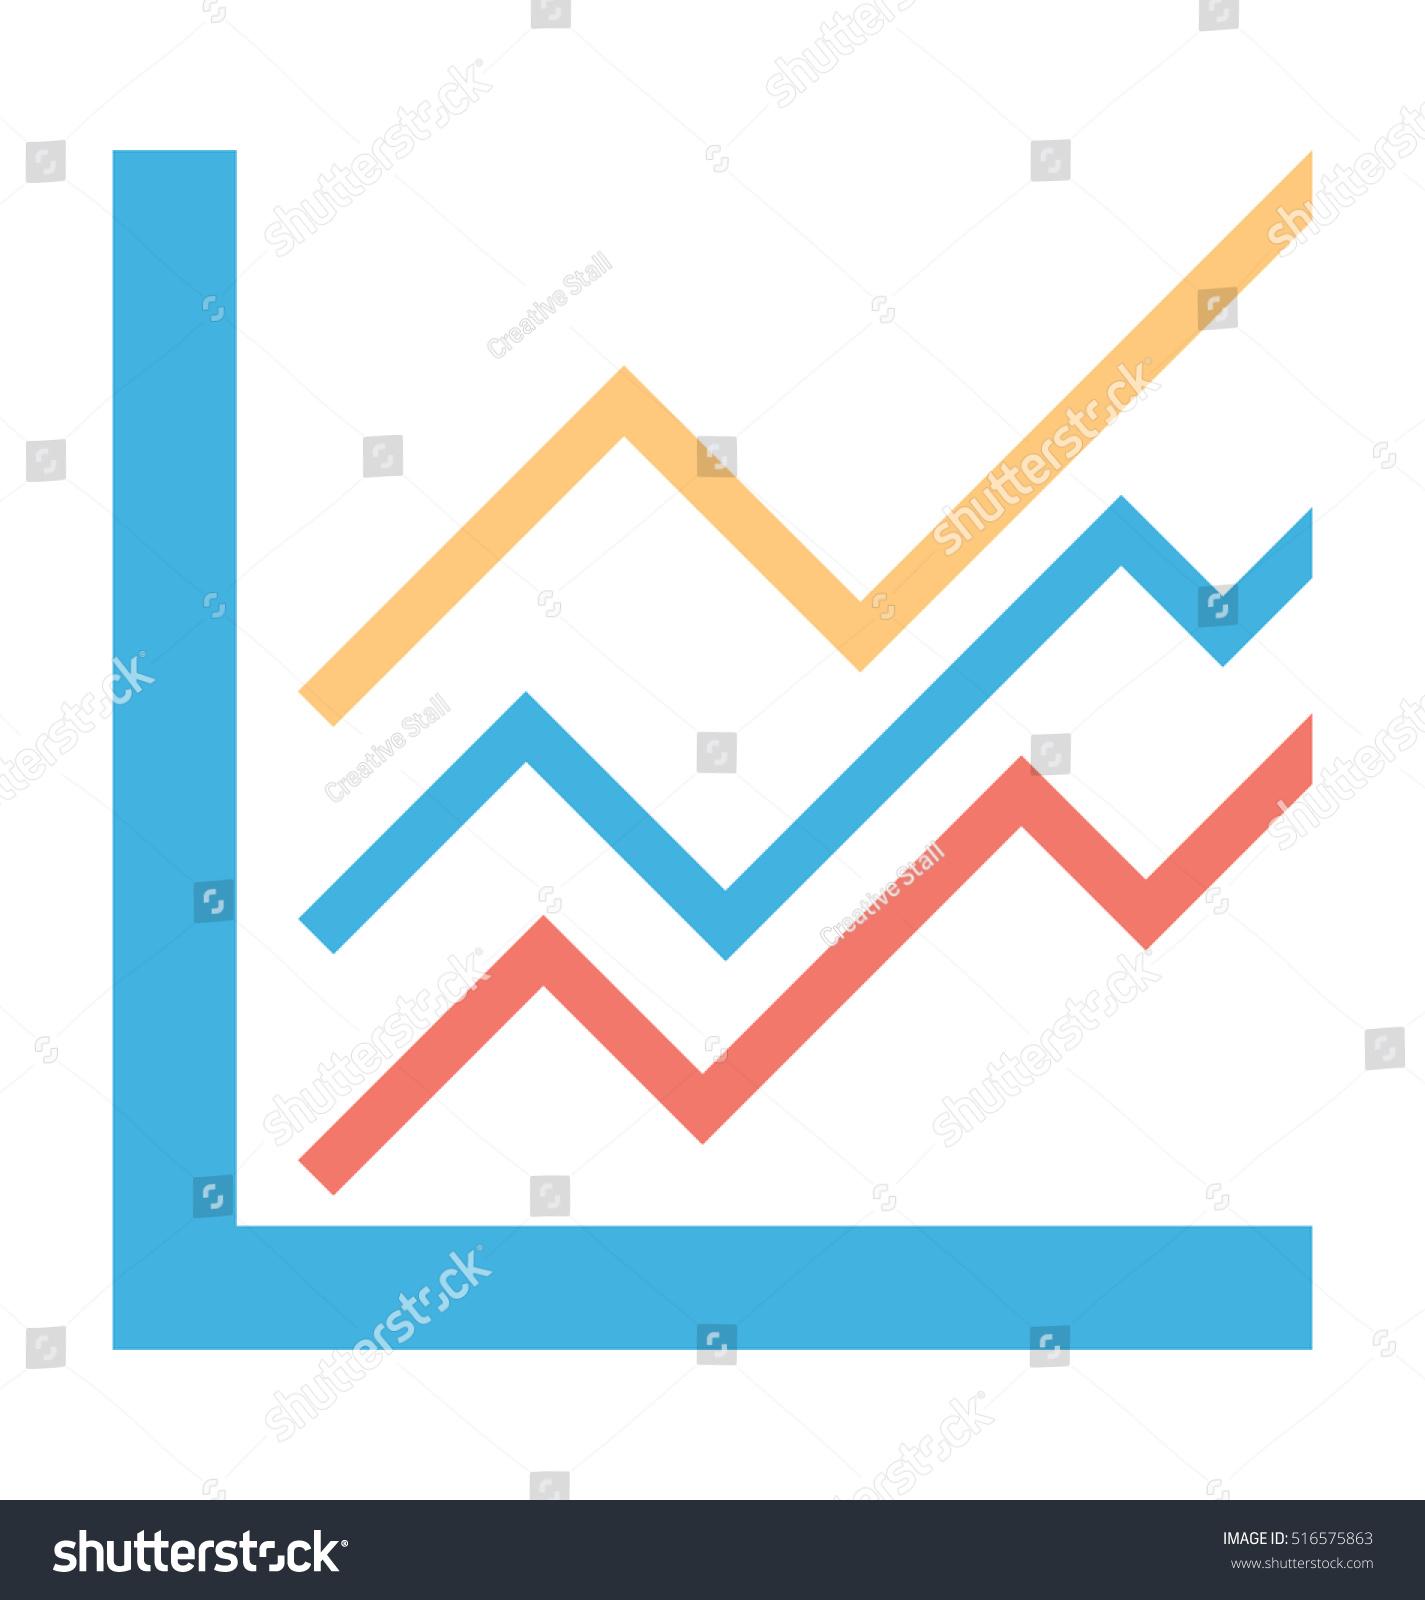 line graph vector icon stock vector (royalty free) 516575863